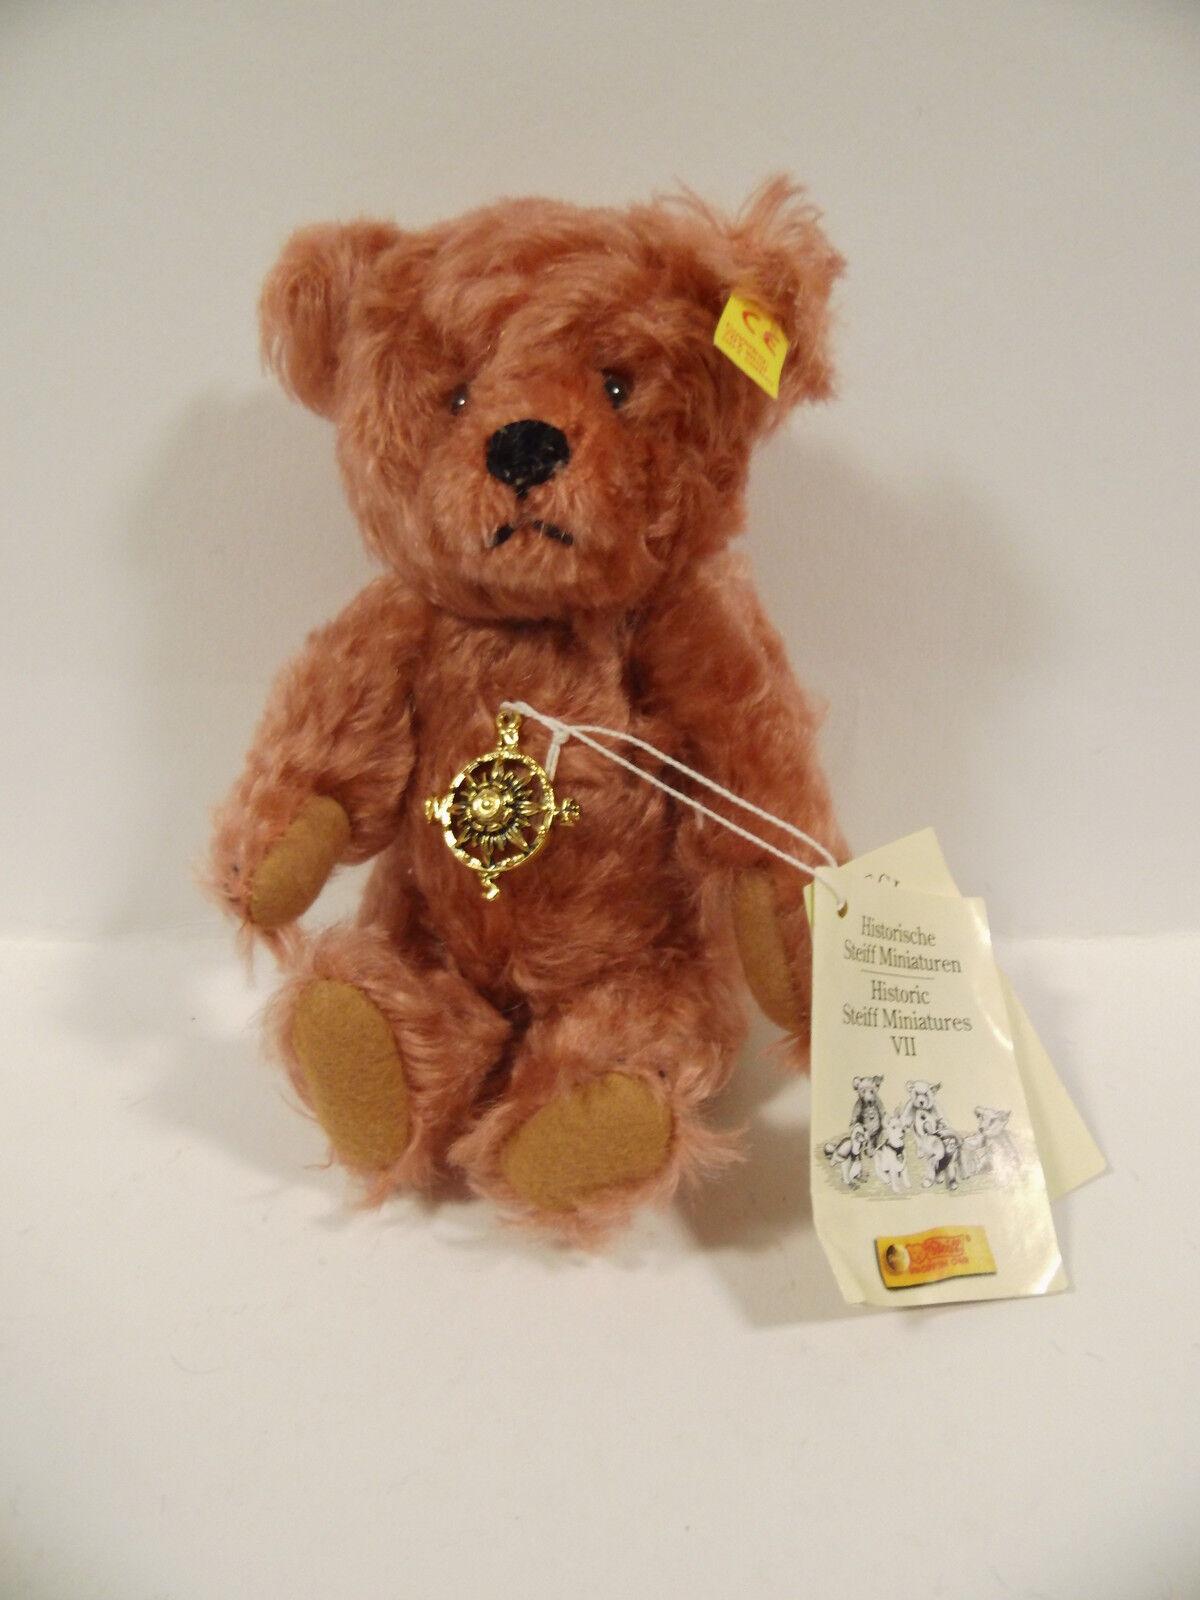 Steiff Teddy - Genuine Mohair - 16 cm - 029608 029608 029608 - Zertifikat - Top Zustand 3f5657